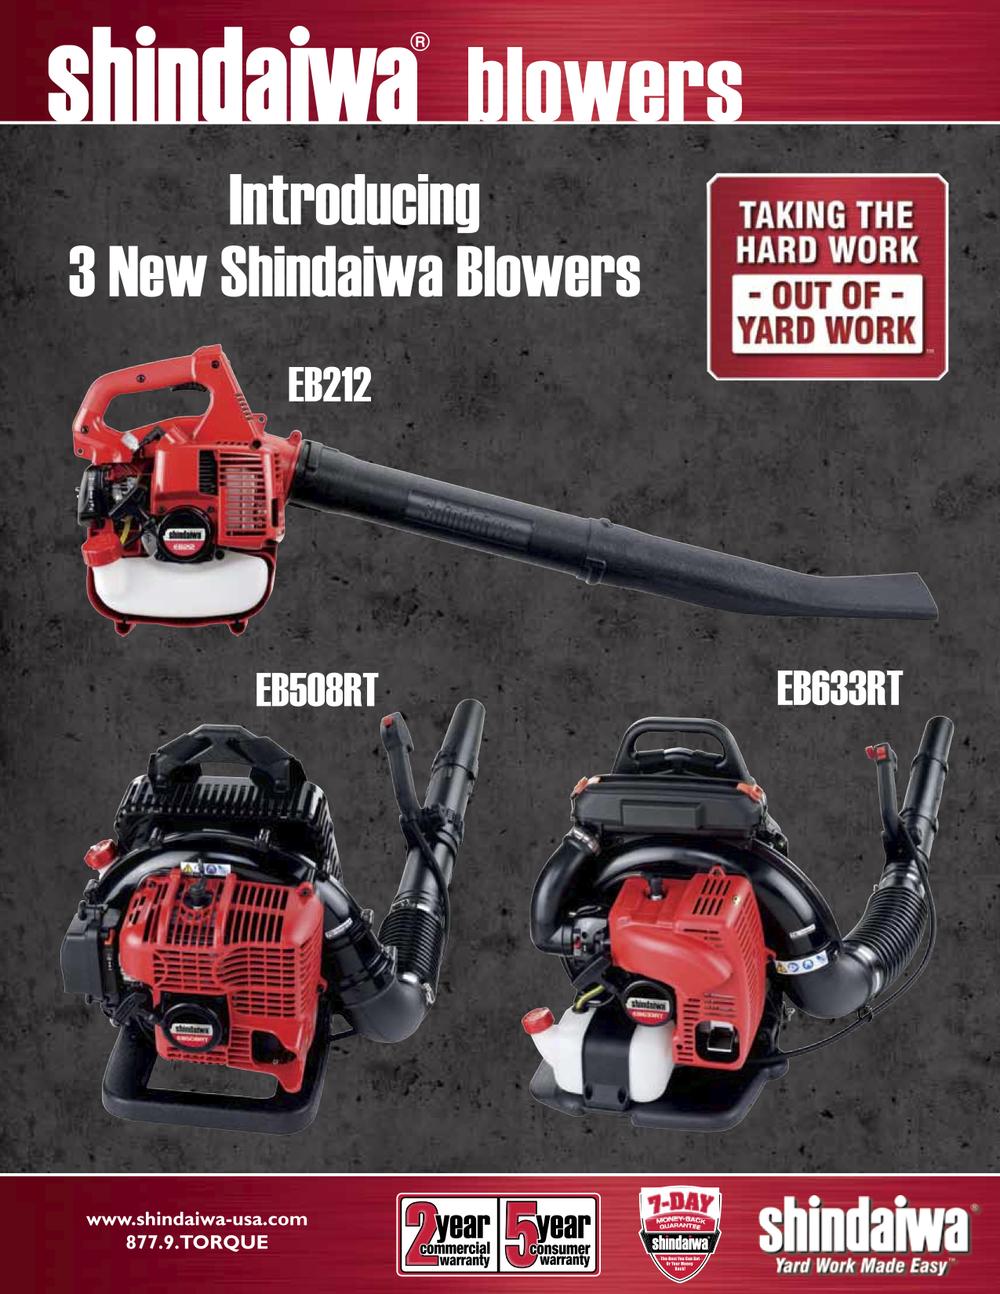 Shindaiwa new blowers 1.jpg